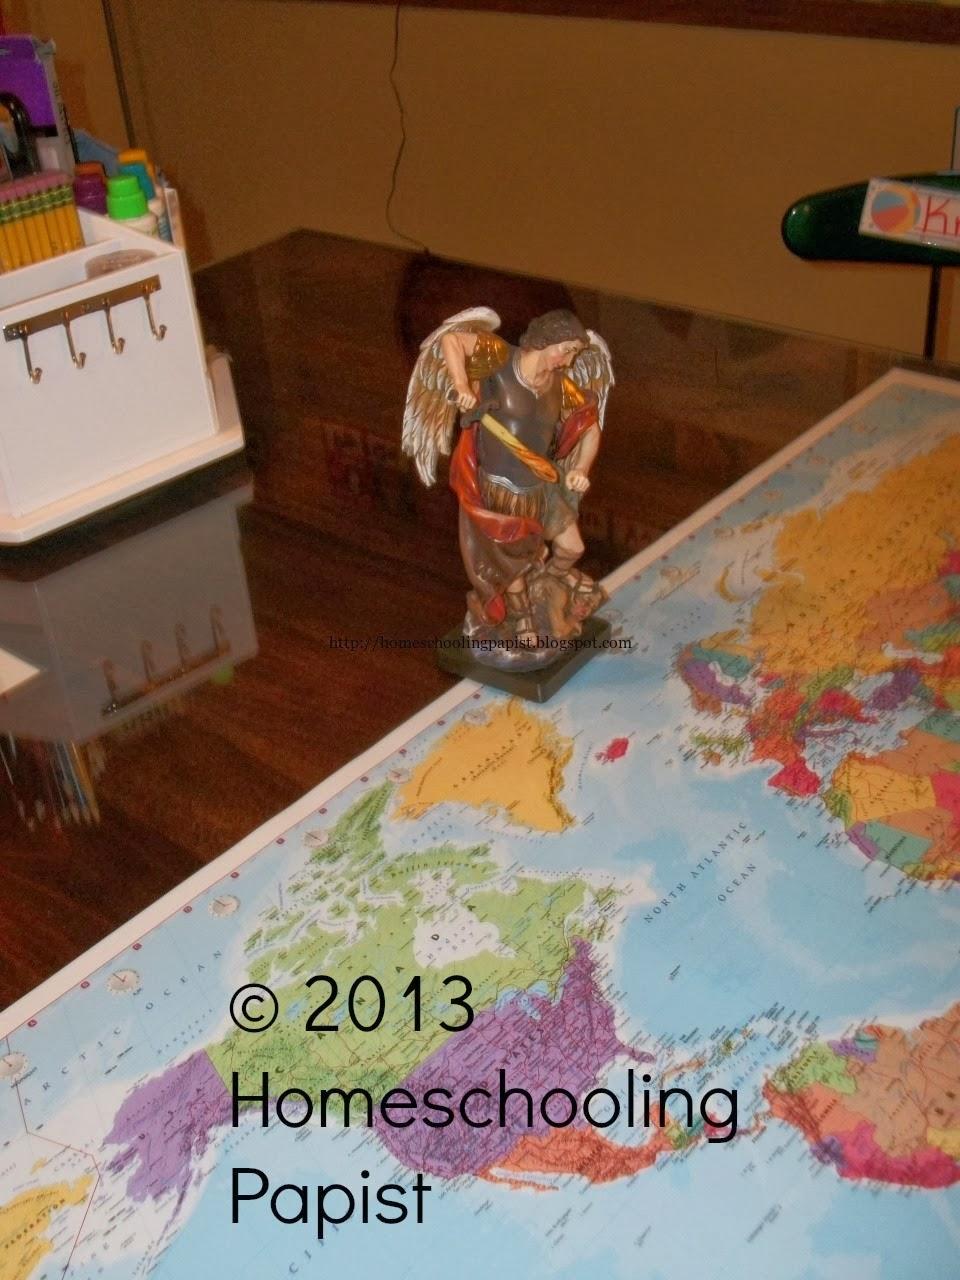 Homeschooling Papist My Craigslist Homeschool Room